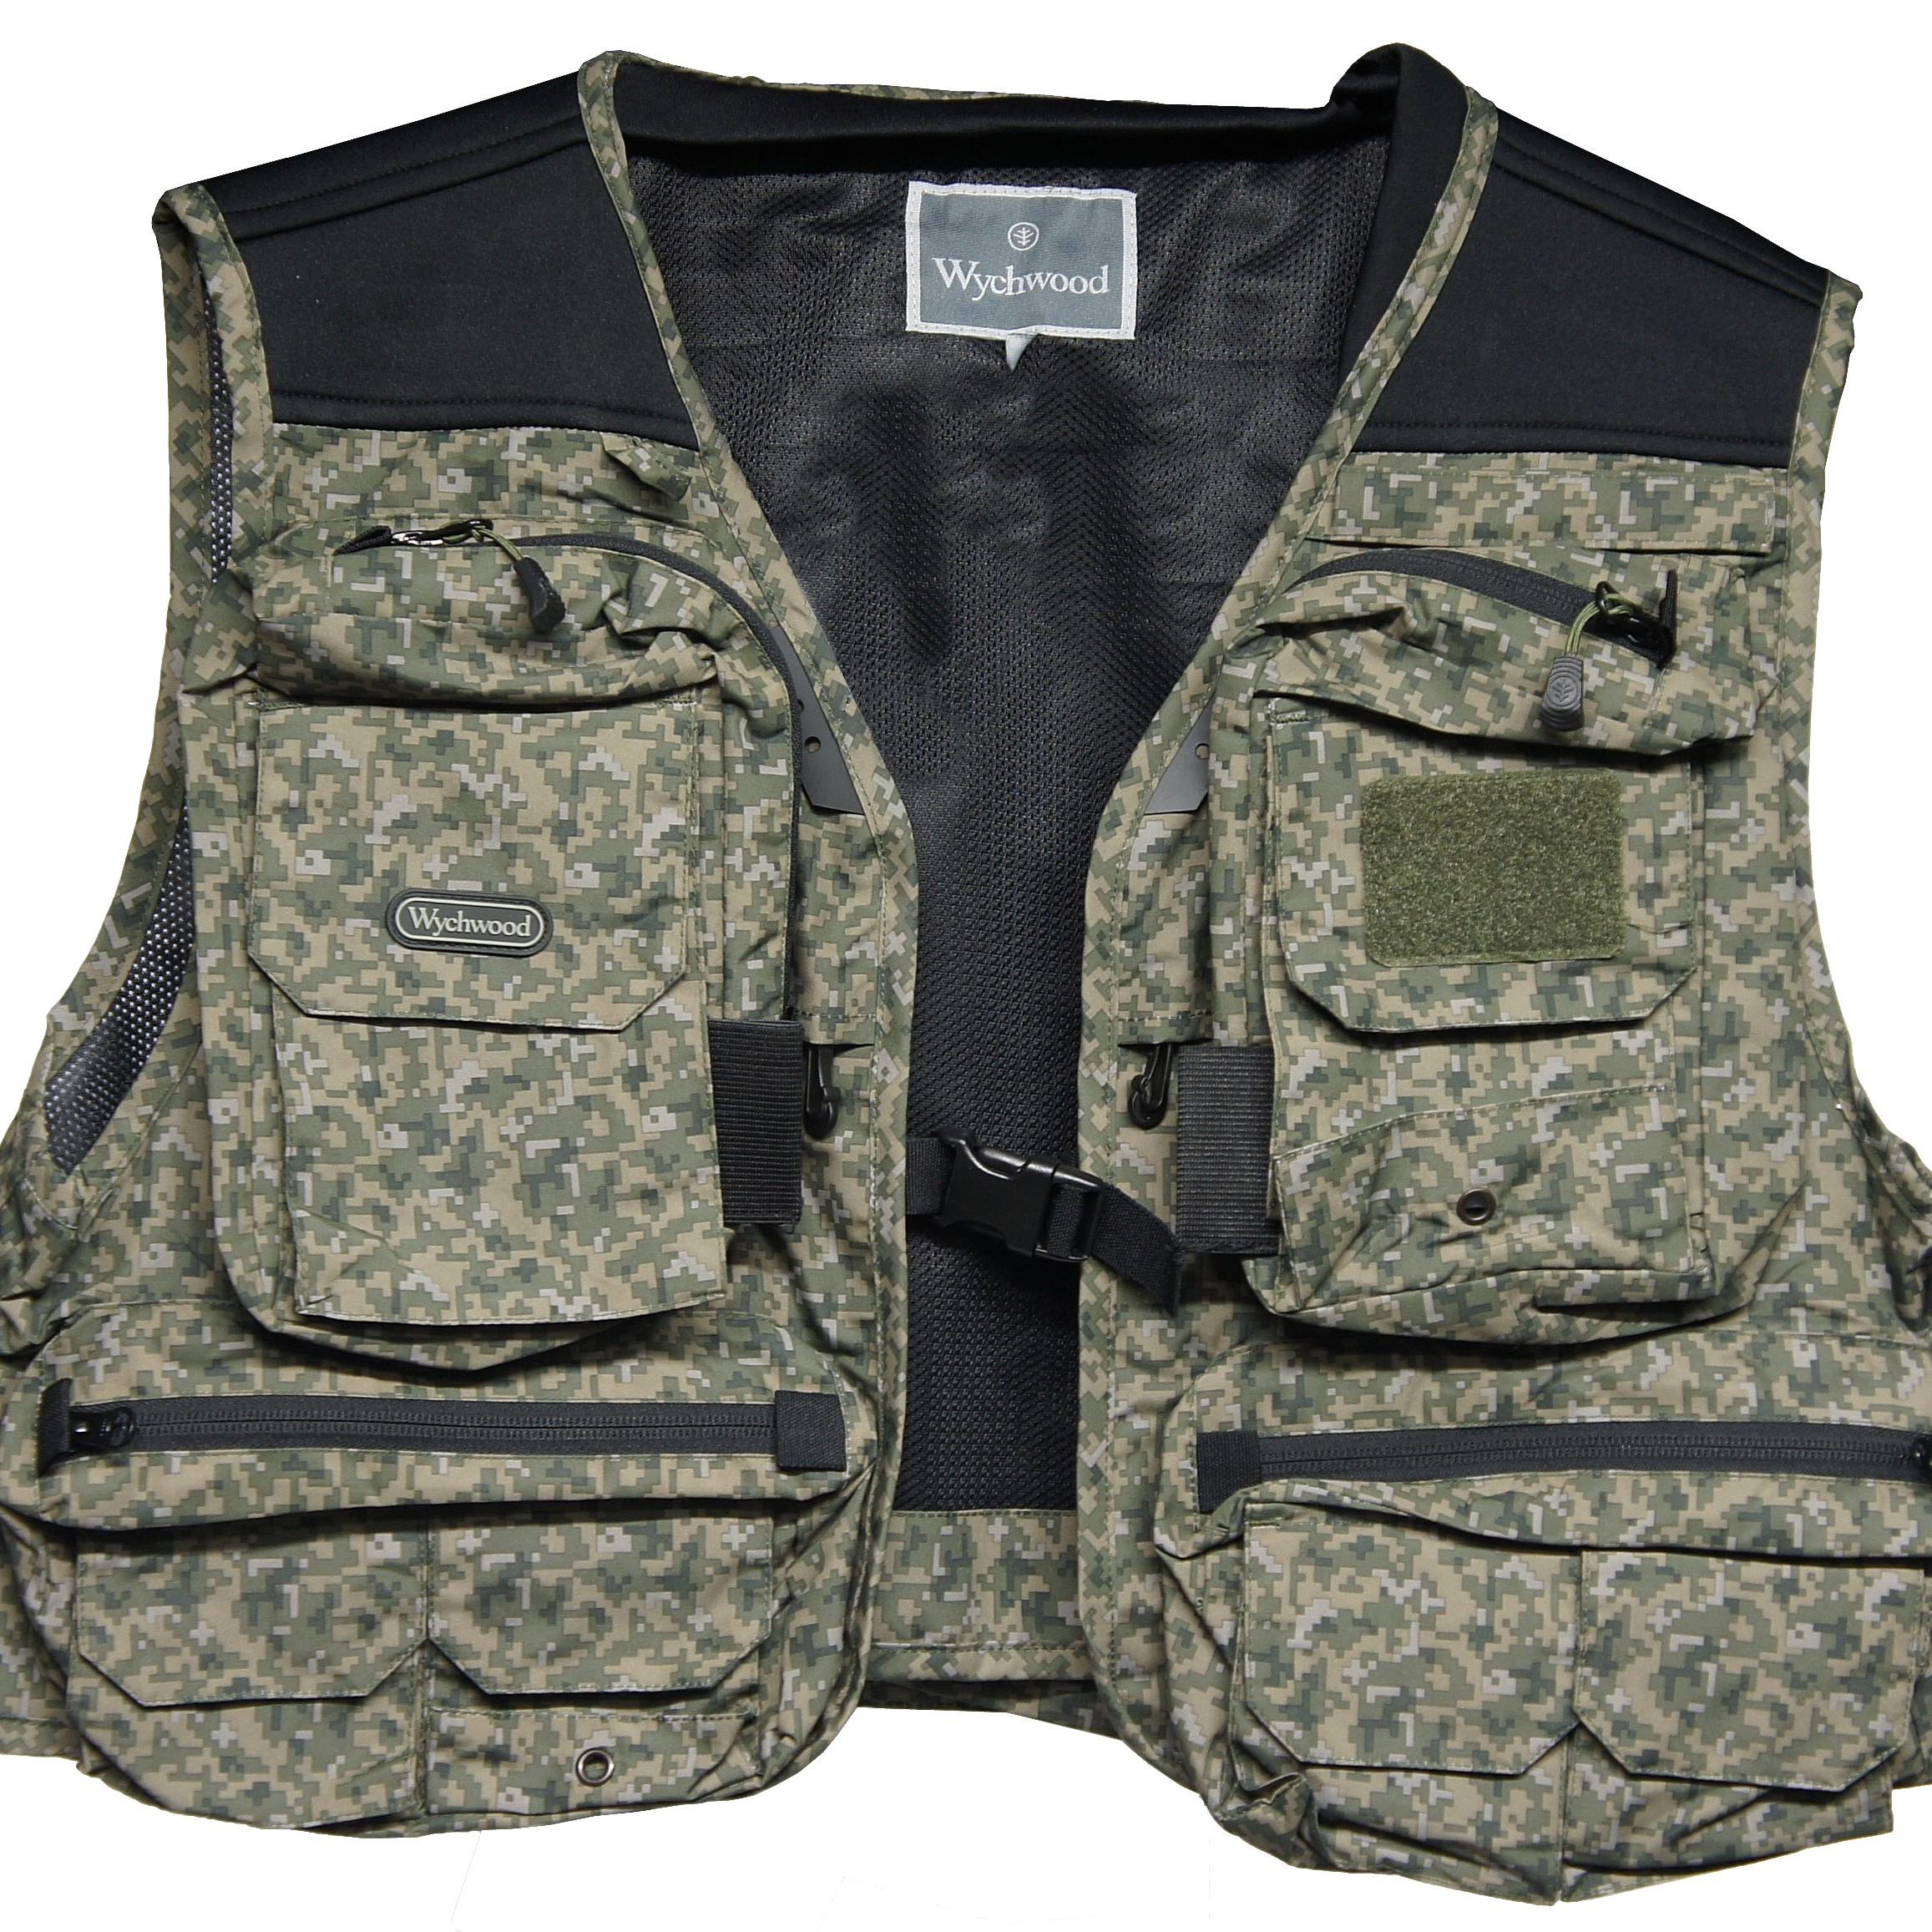 Wychwood Waistcoat Fishing Vest M